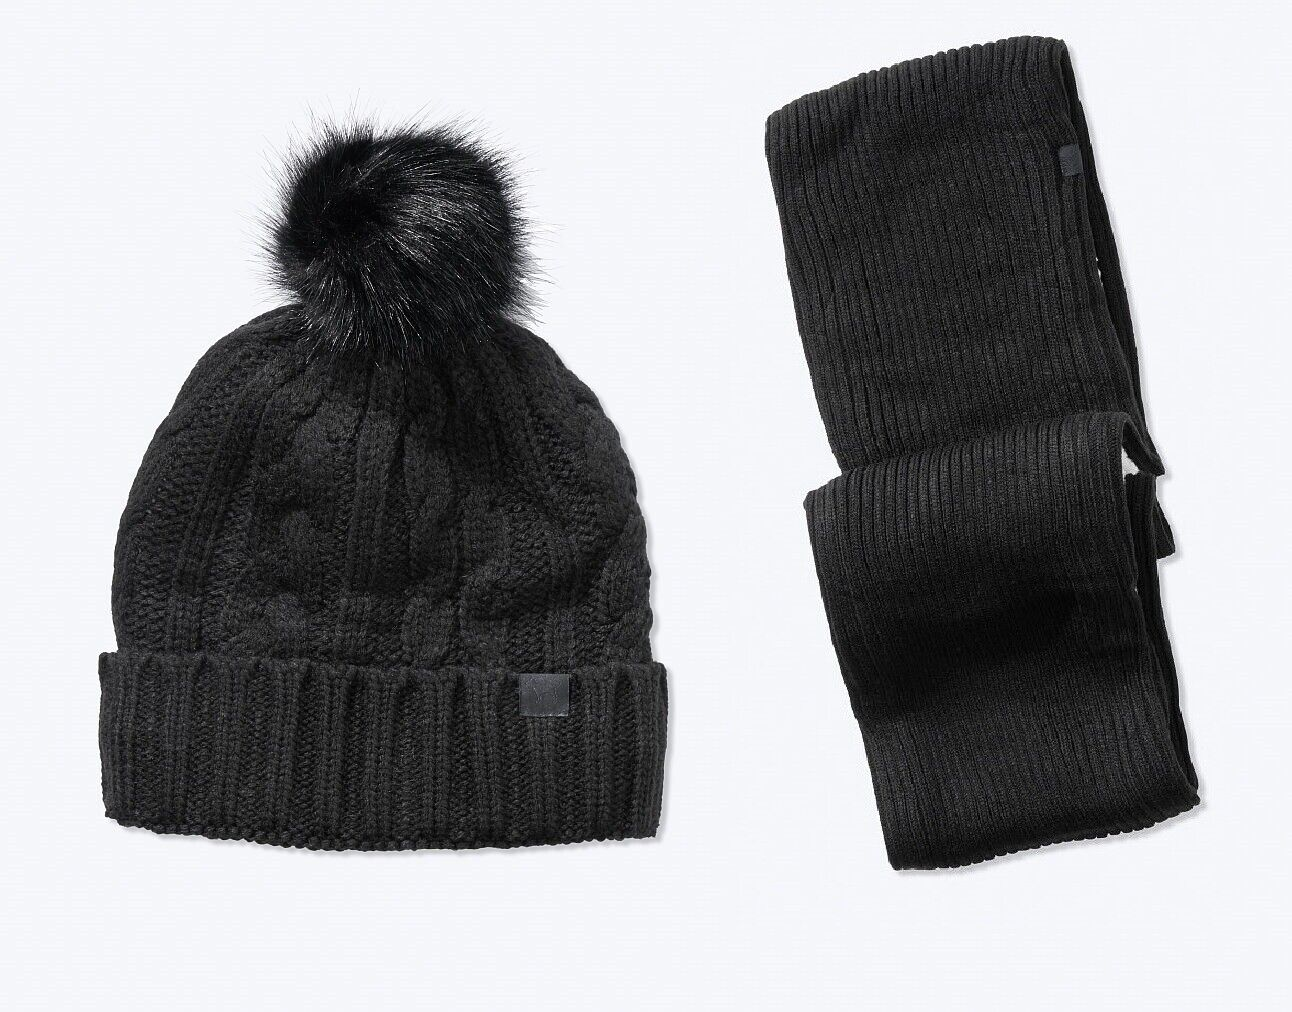 Victoria's Secret PINK Winter Sherpa Lined Hat Beanie/Scarf Set Black 2020 NEW!